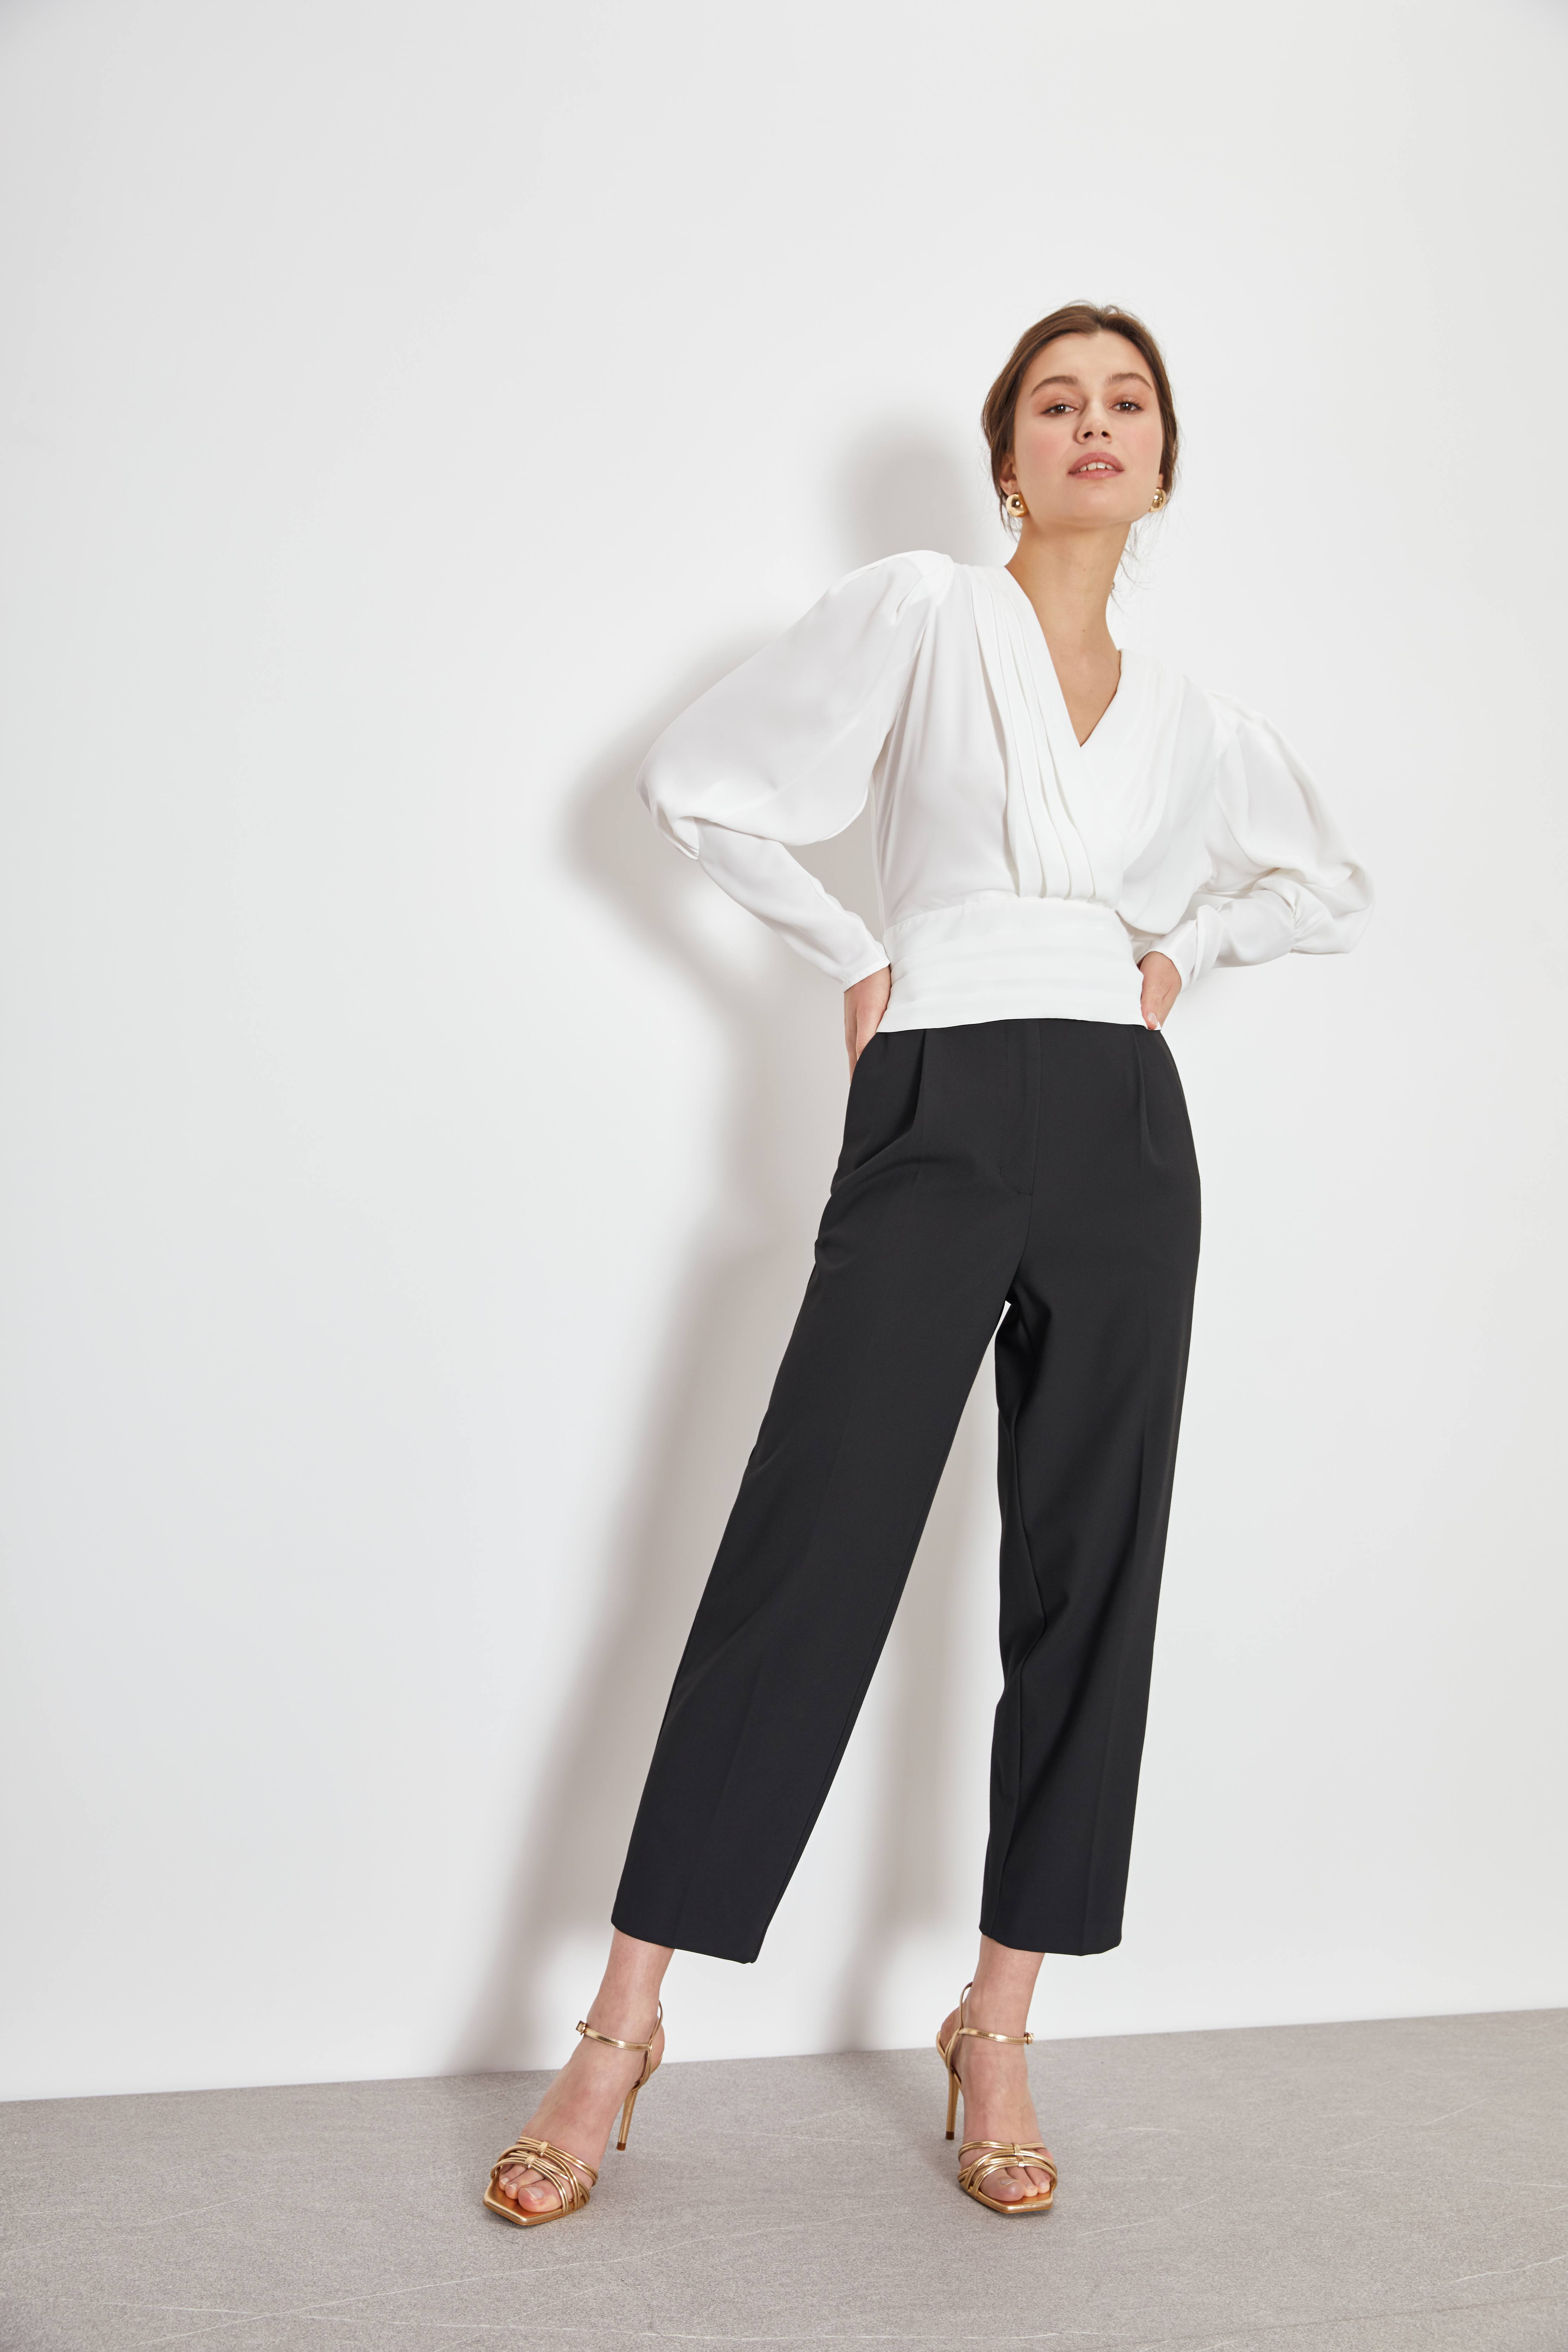 Блузка LIME Блузка с объемными рукавами блузка lime блузка с эластичной талией